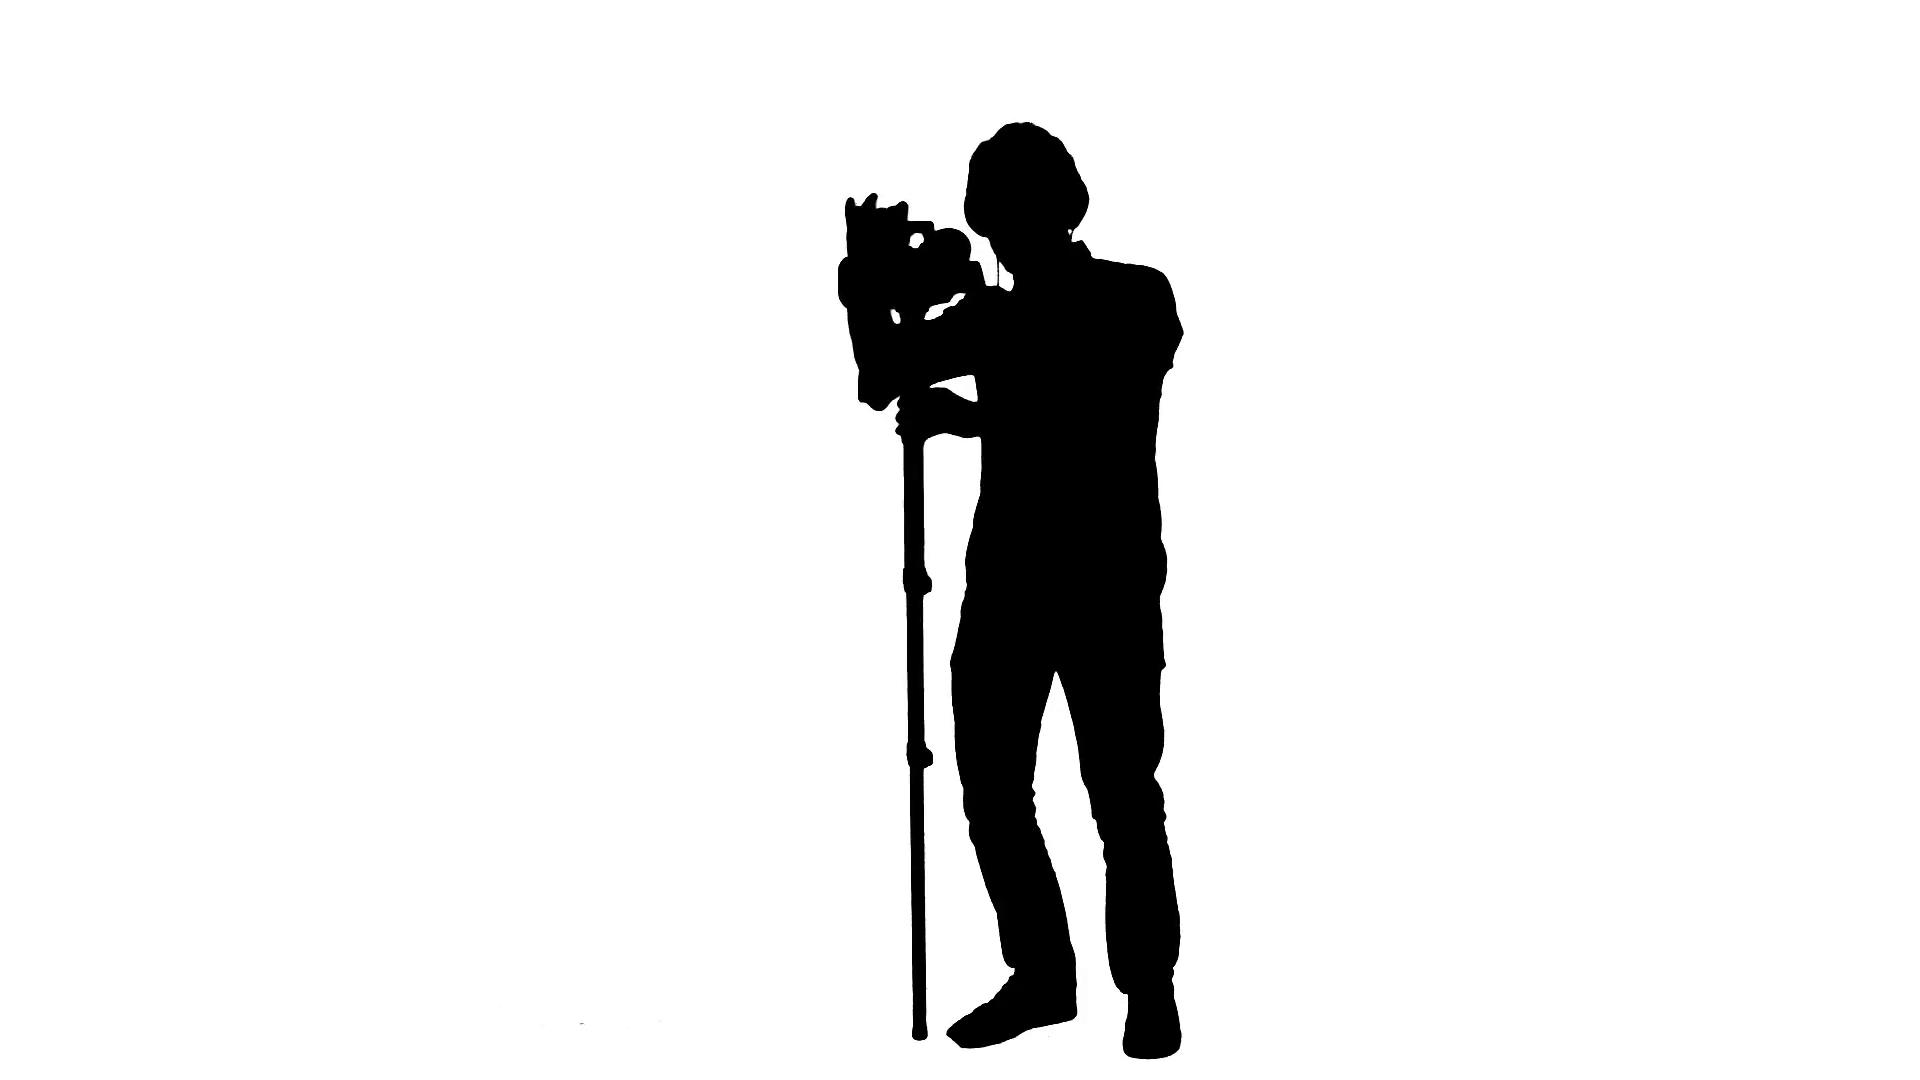 1920x1080 Cameraman Monopod Silhouette Working